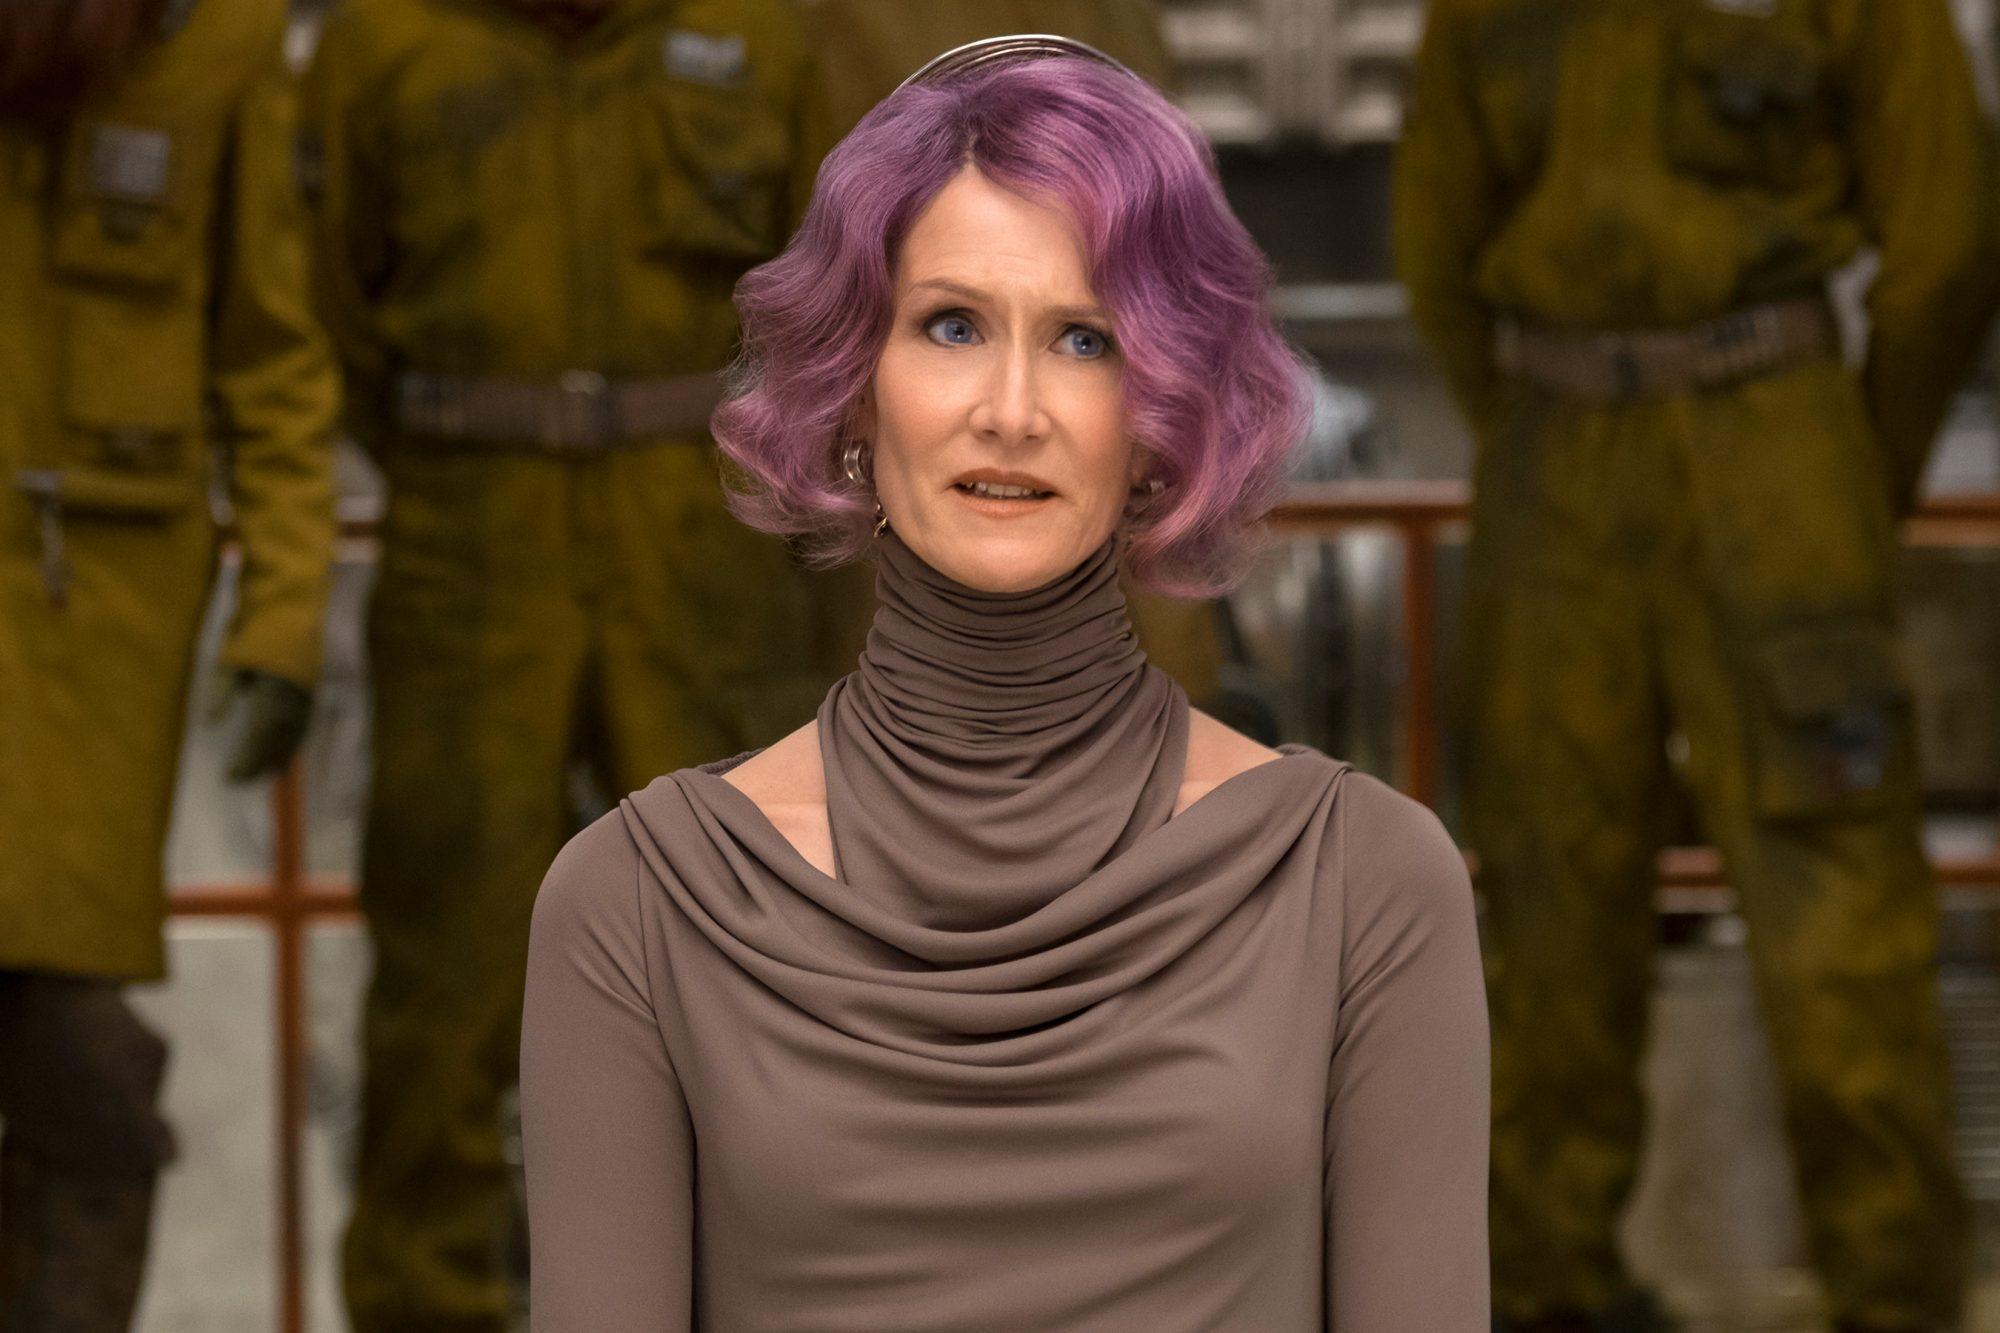 Star Wars The Last Jedi Scene Causes Movie Theaters To Post Warning Ew Com